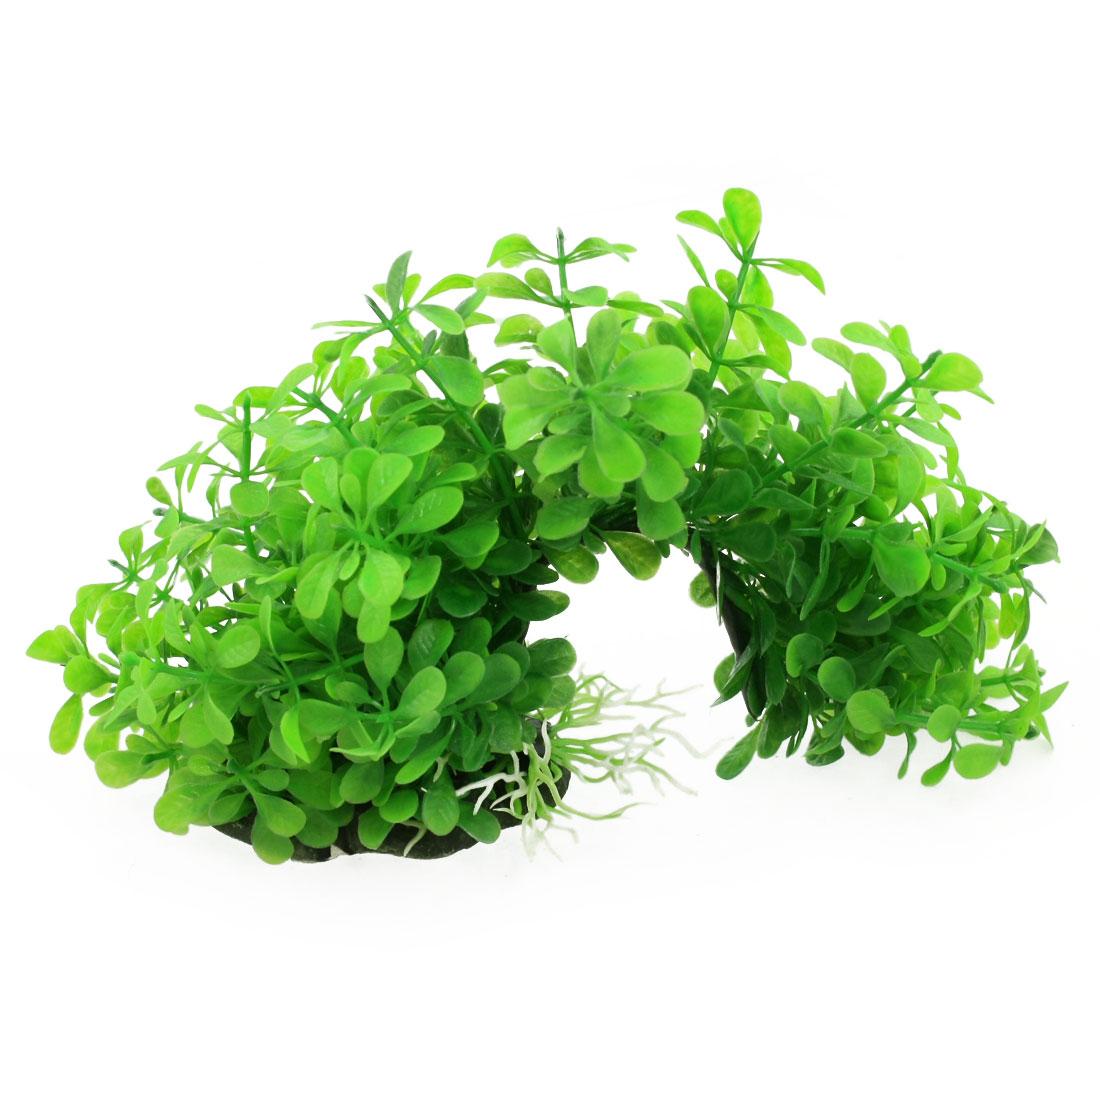 "Aquarium 8.6"" Width Emulational Curved Plants Green Aquascaping"